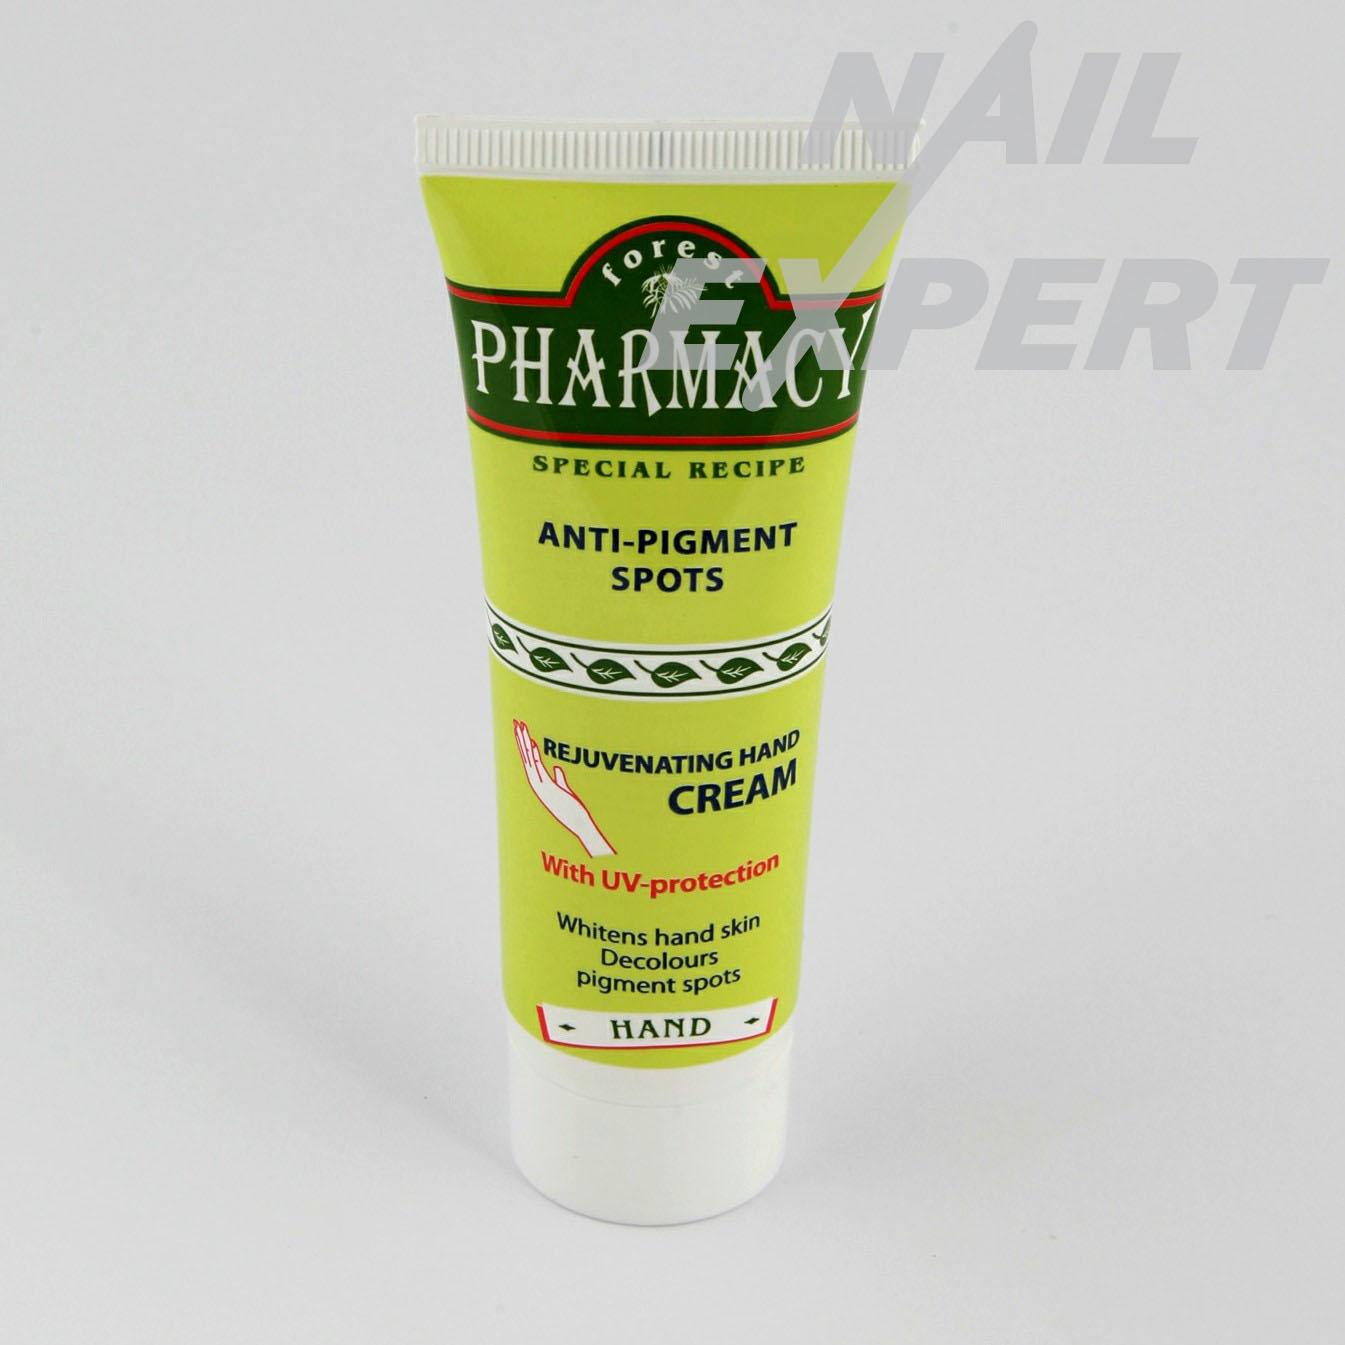 Nail Expert Rejuvenating hand cream